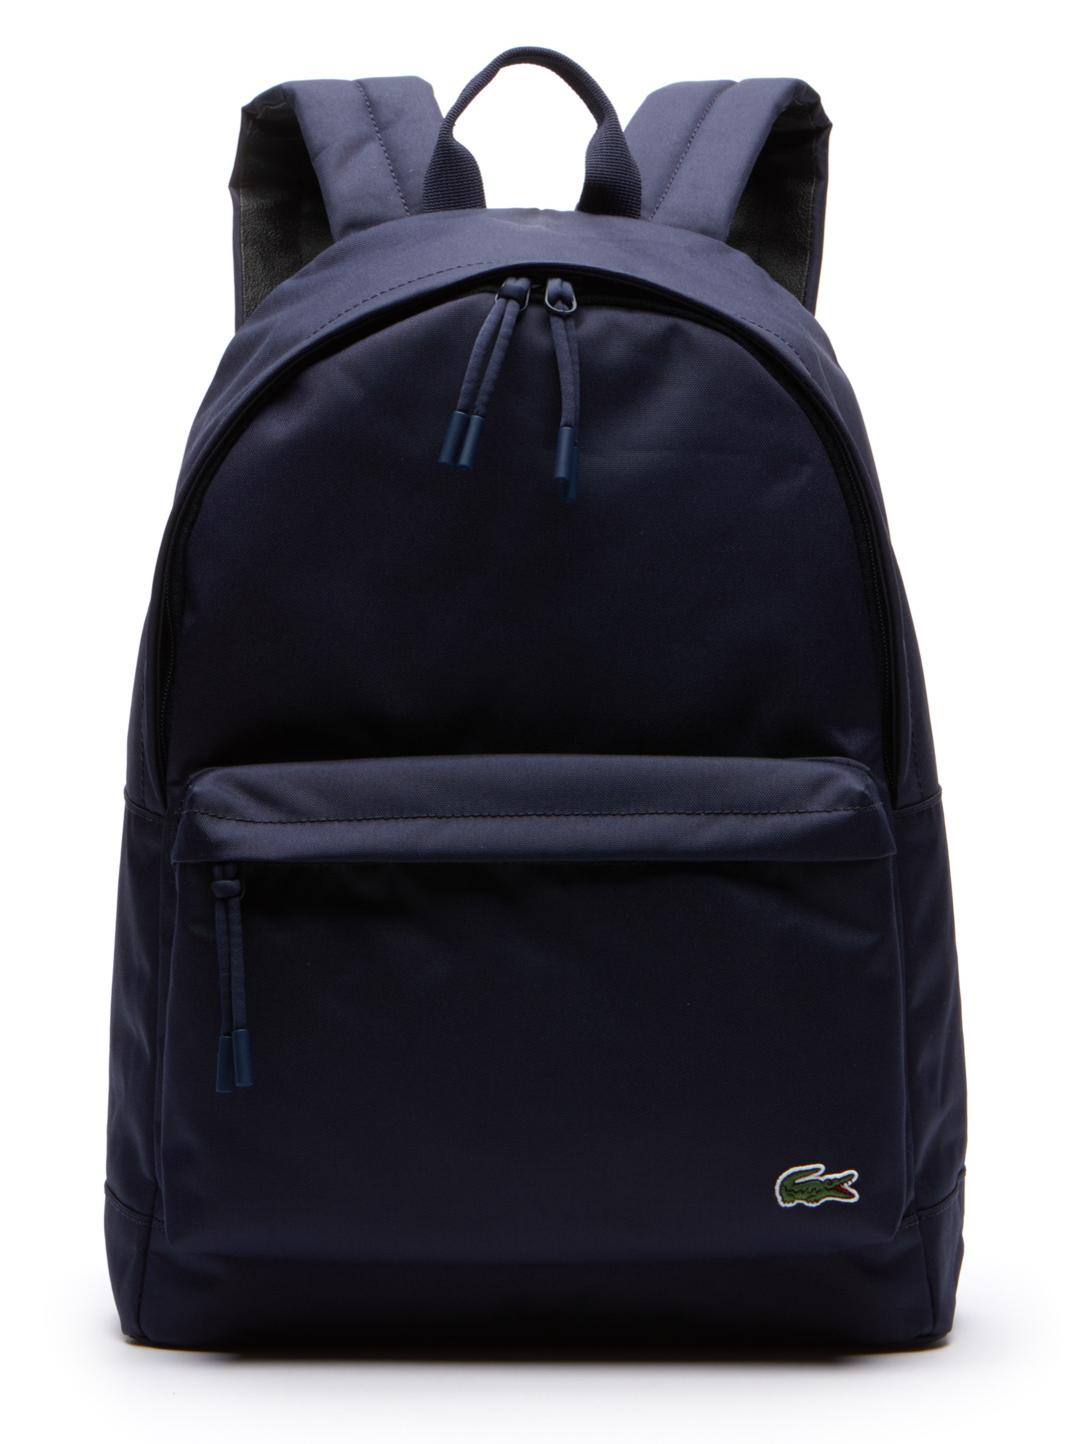 Sac Ebay Lacoste Peacoat Neocroc Dos À Backpack dYnwnz1qO ba174b409e6